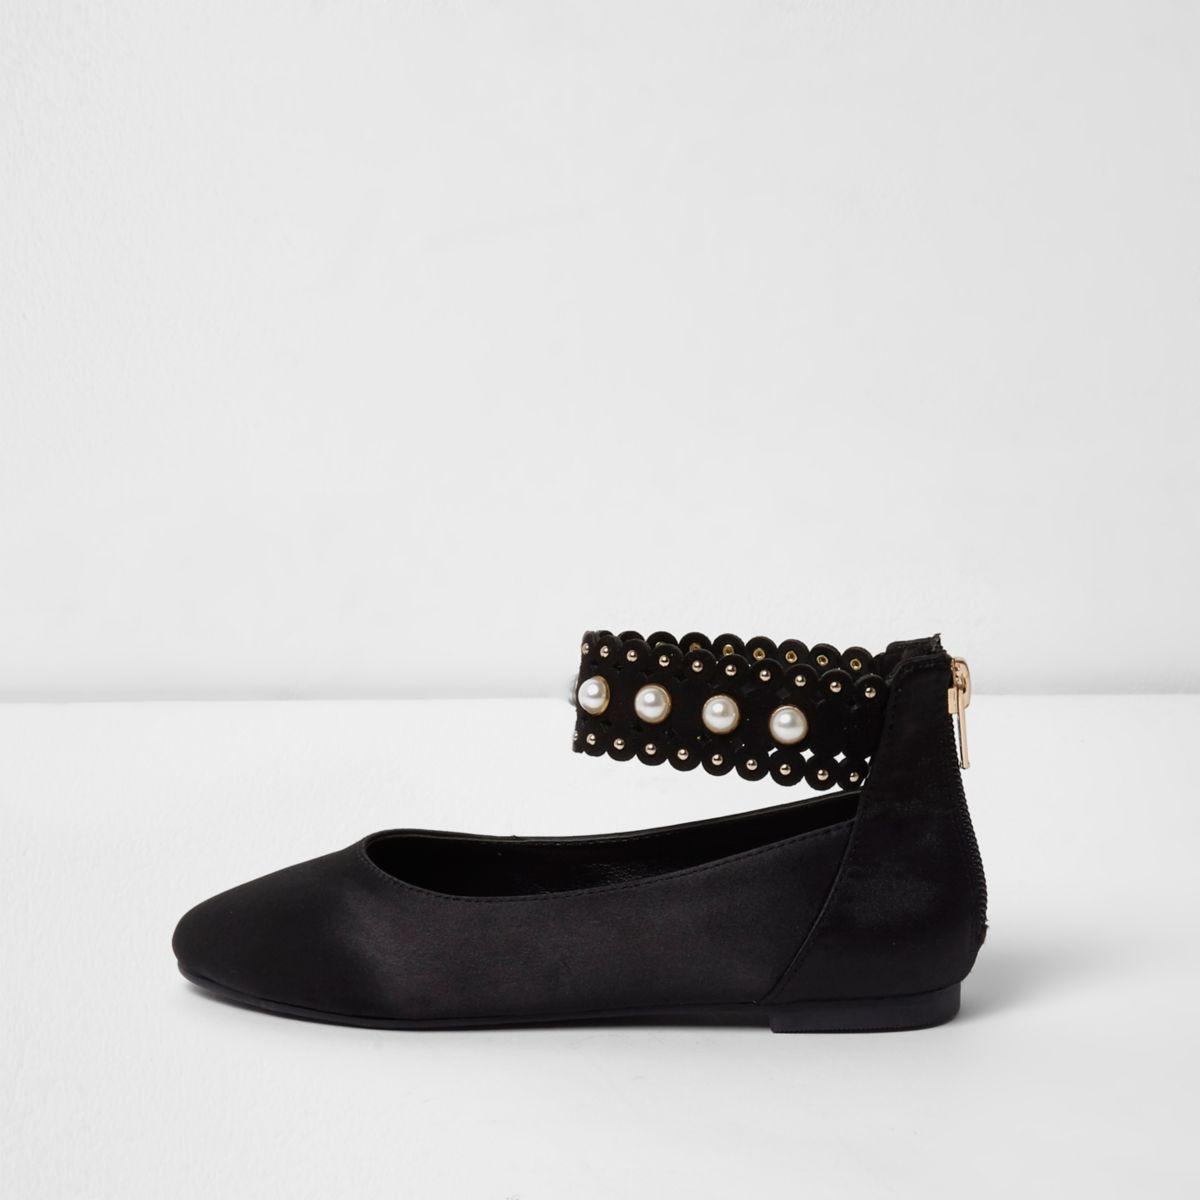 Girls black satin faux pearl ballerina shoes